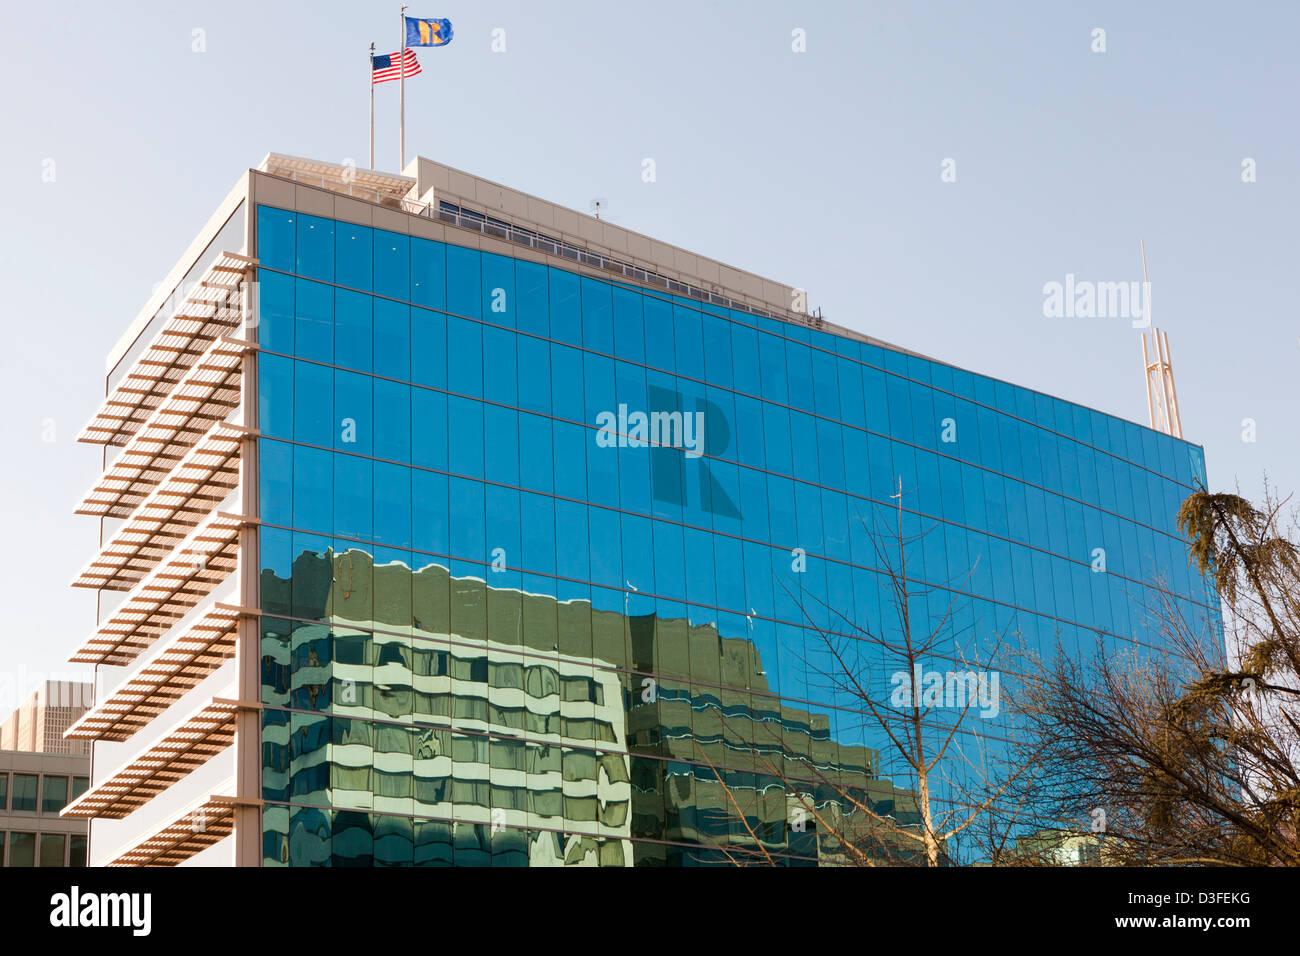 National Association of Realtors building - Washington, DC - Stock Image